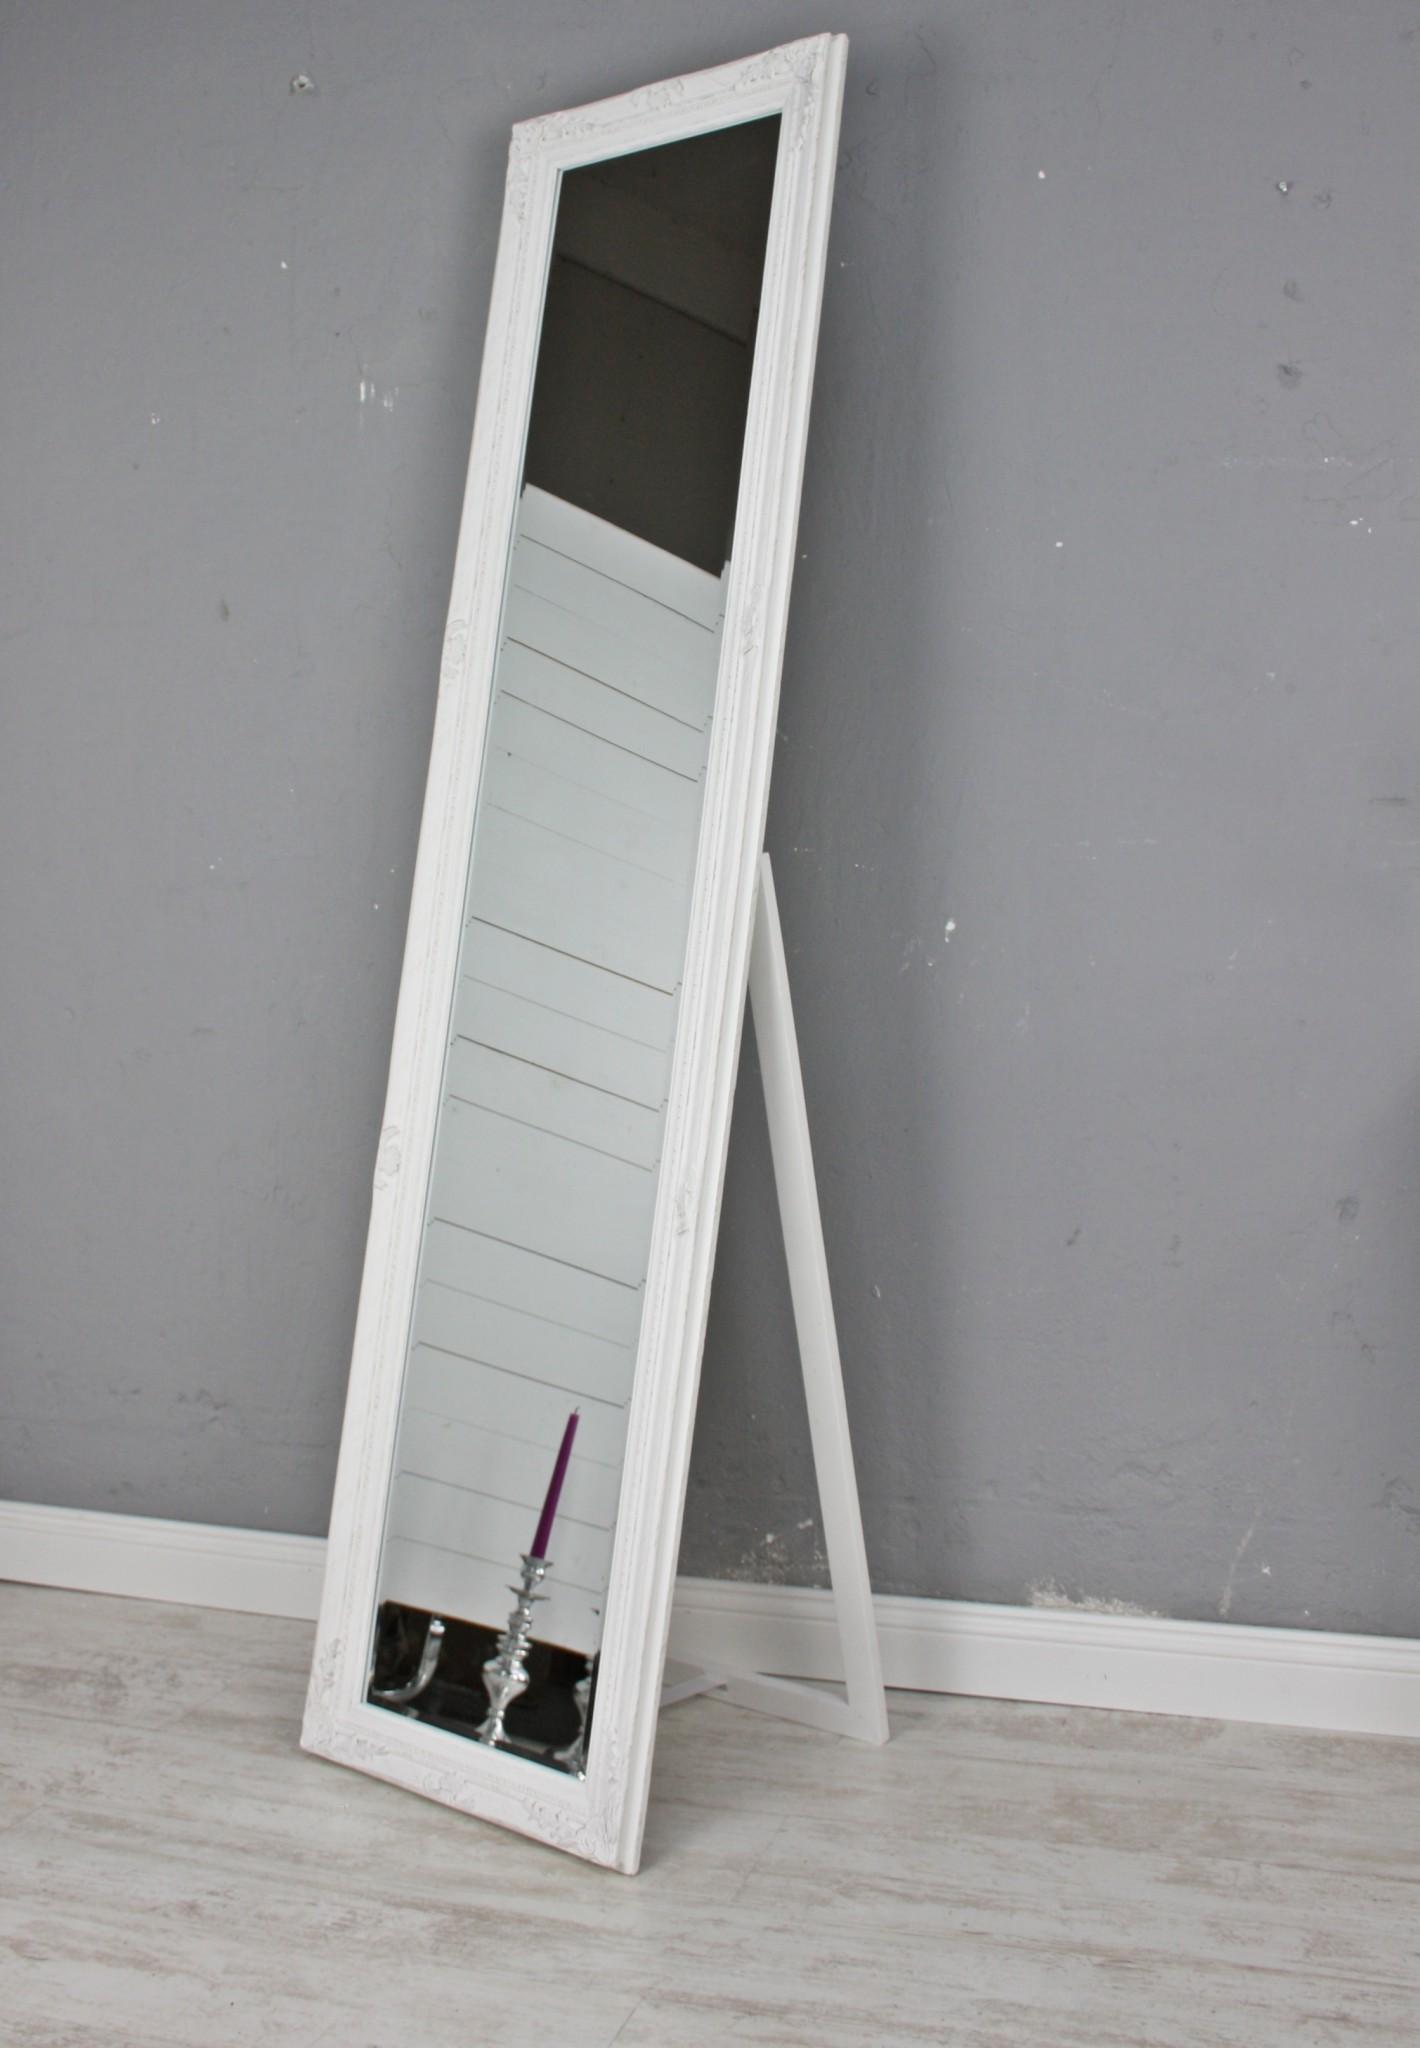 standspiegel wei antik gro 180cm holz wandspiegel barock badspiegel landhaus ebay. Black Bedroom Furniture Sets. Home Design Ideas